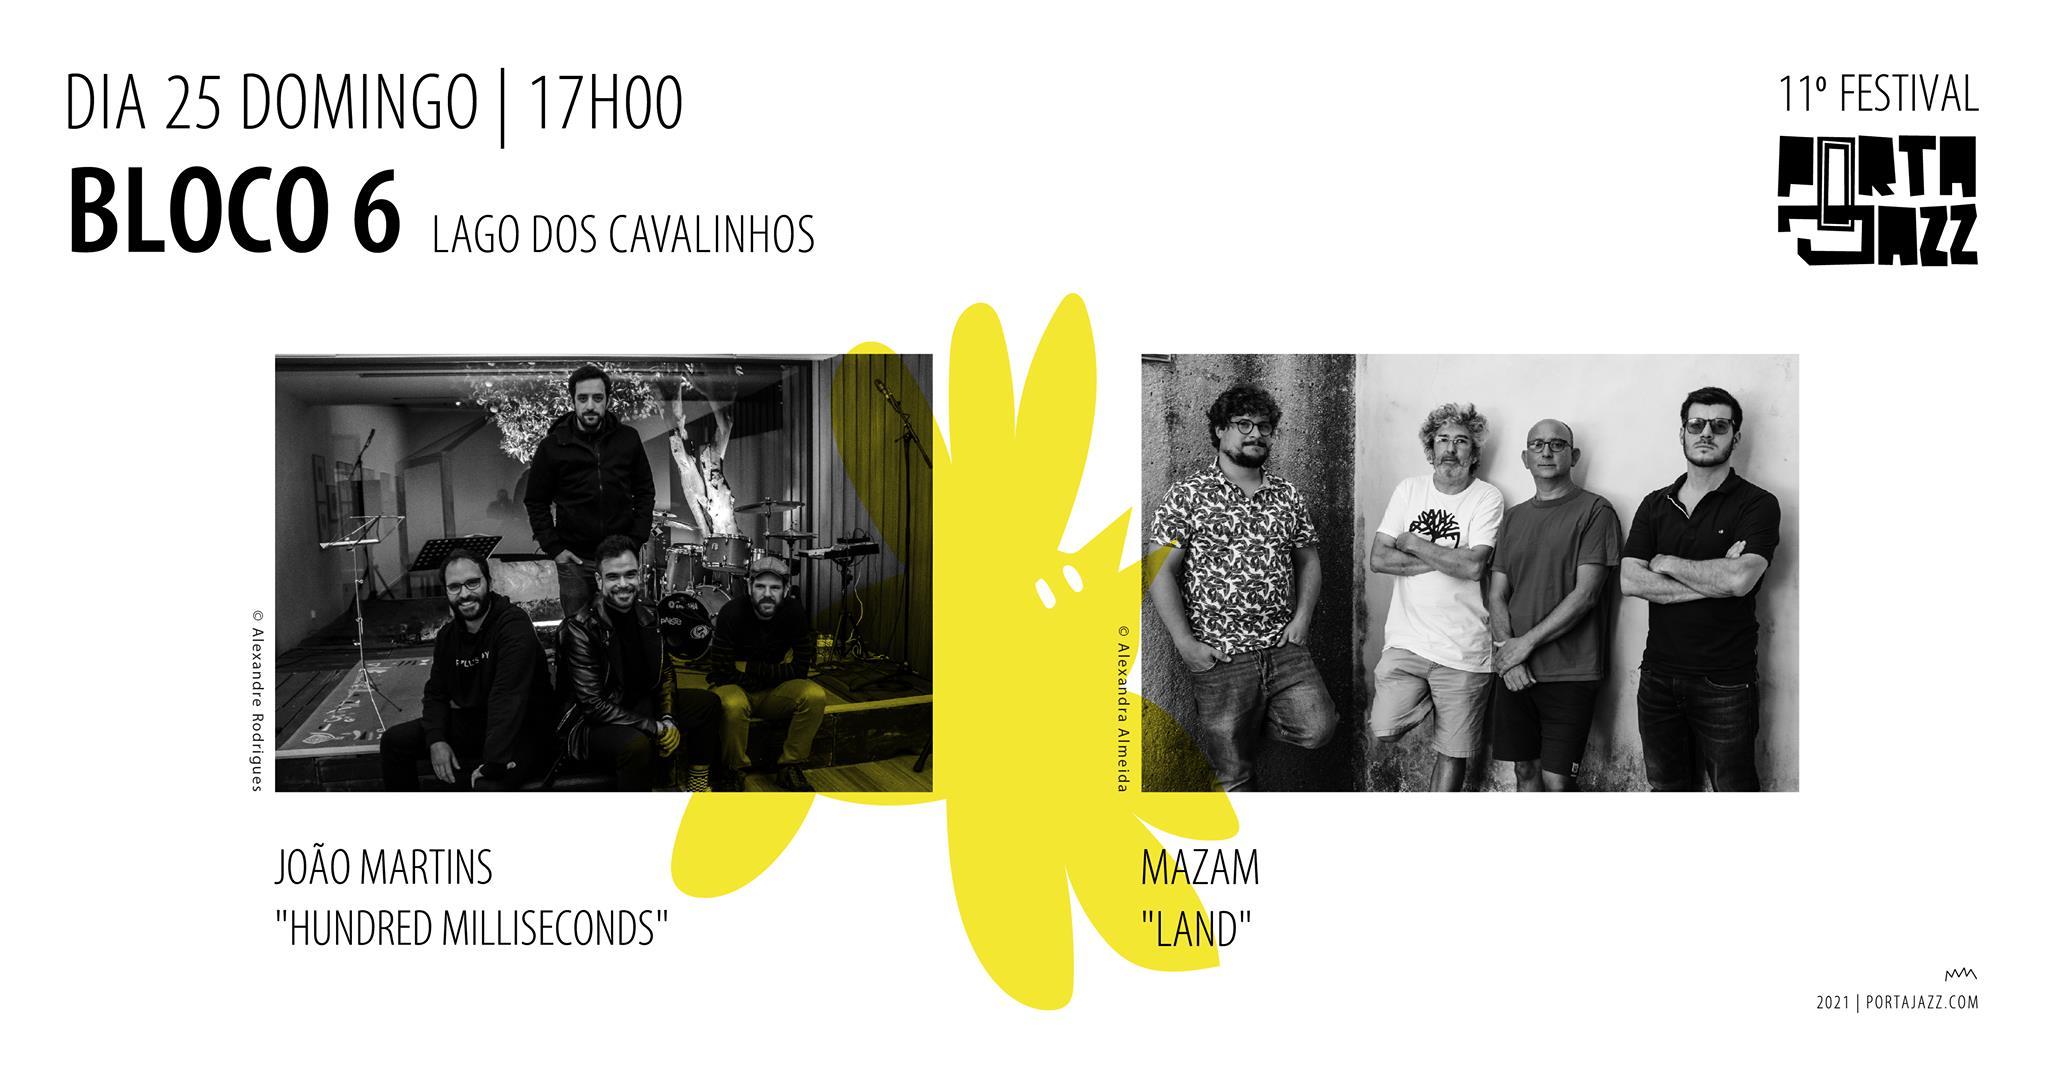 11º Festival Porta-Jazz    Bloco 6   João Martins 'Hundred Milliseconds' + Mazam 'Land'